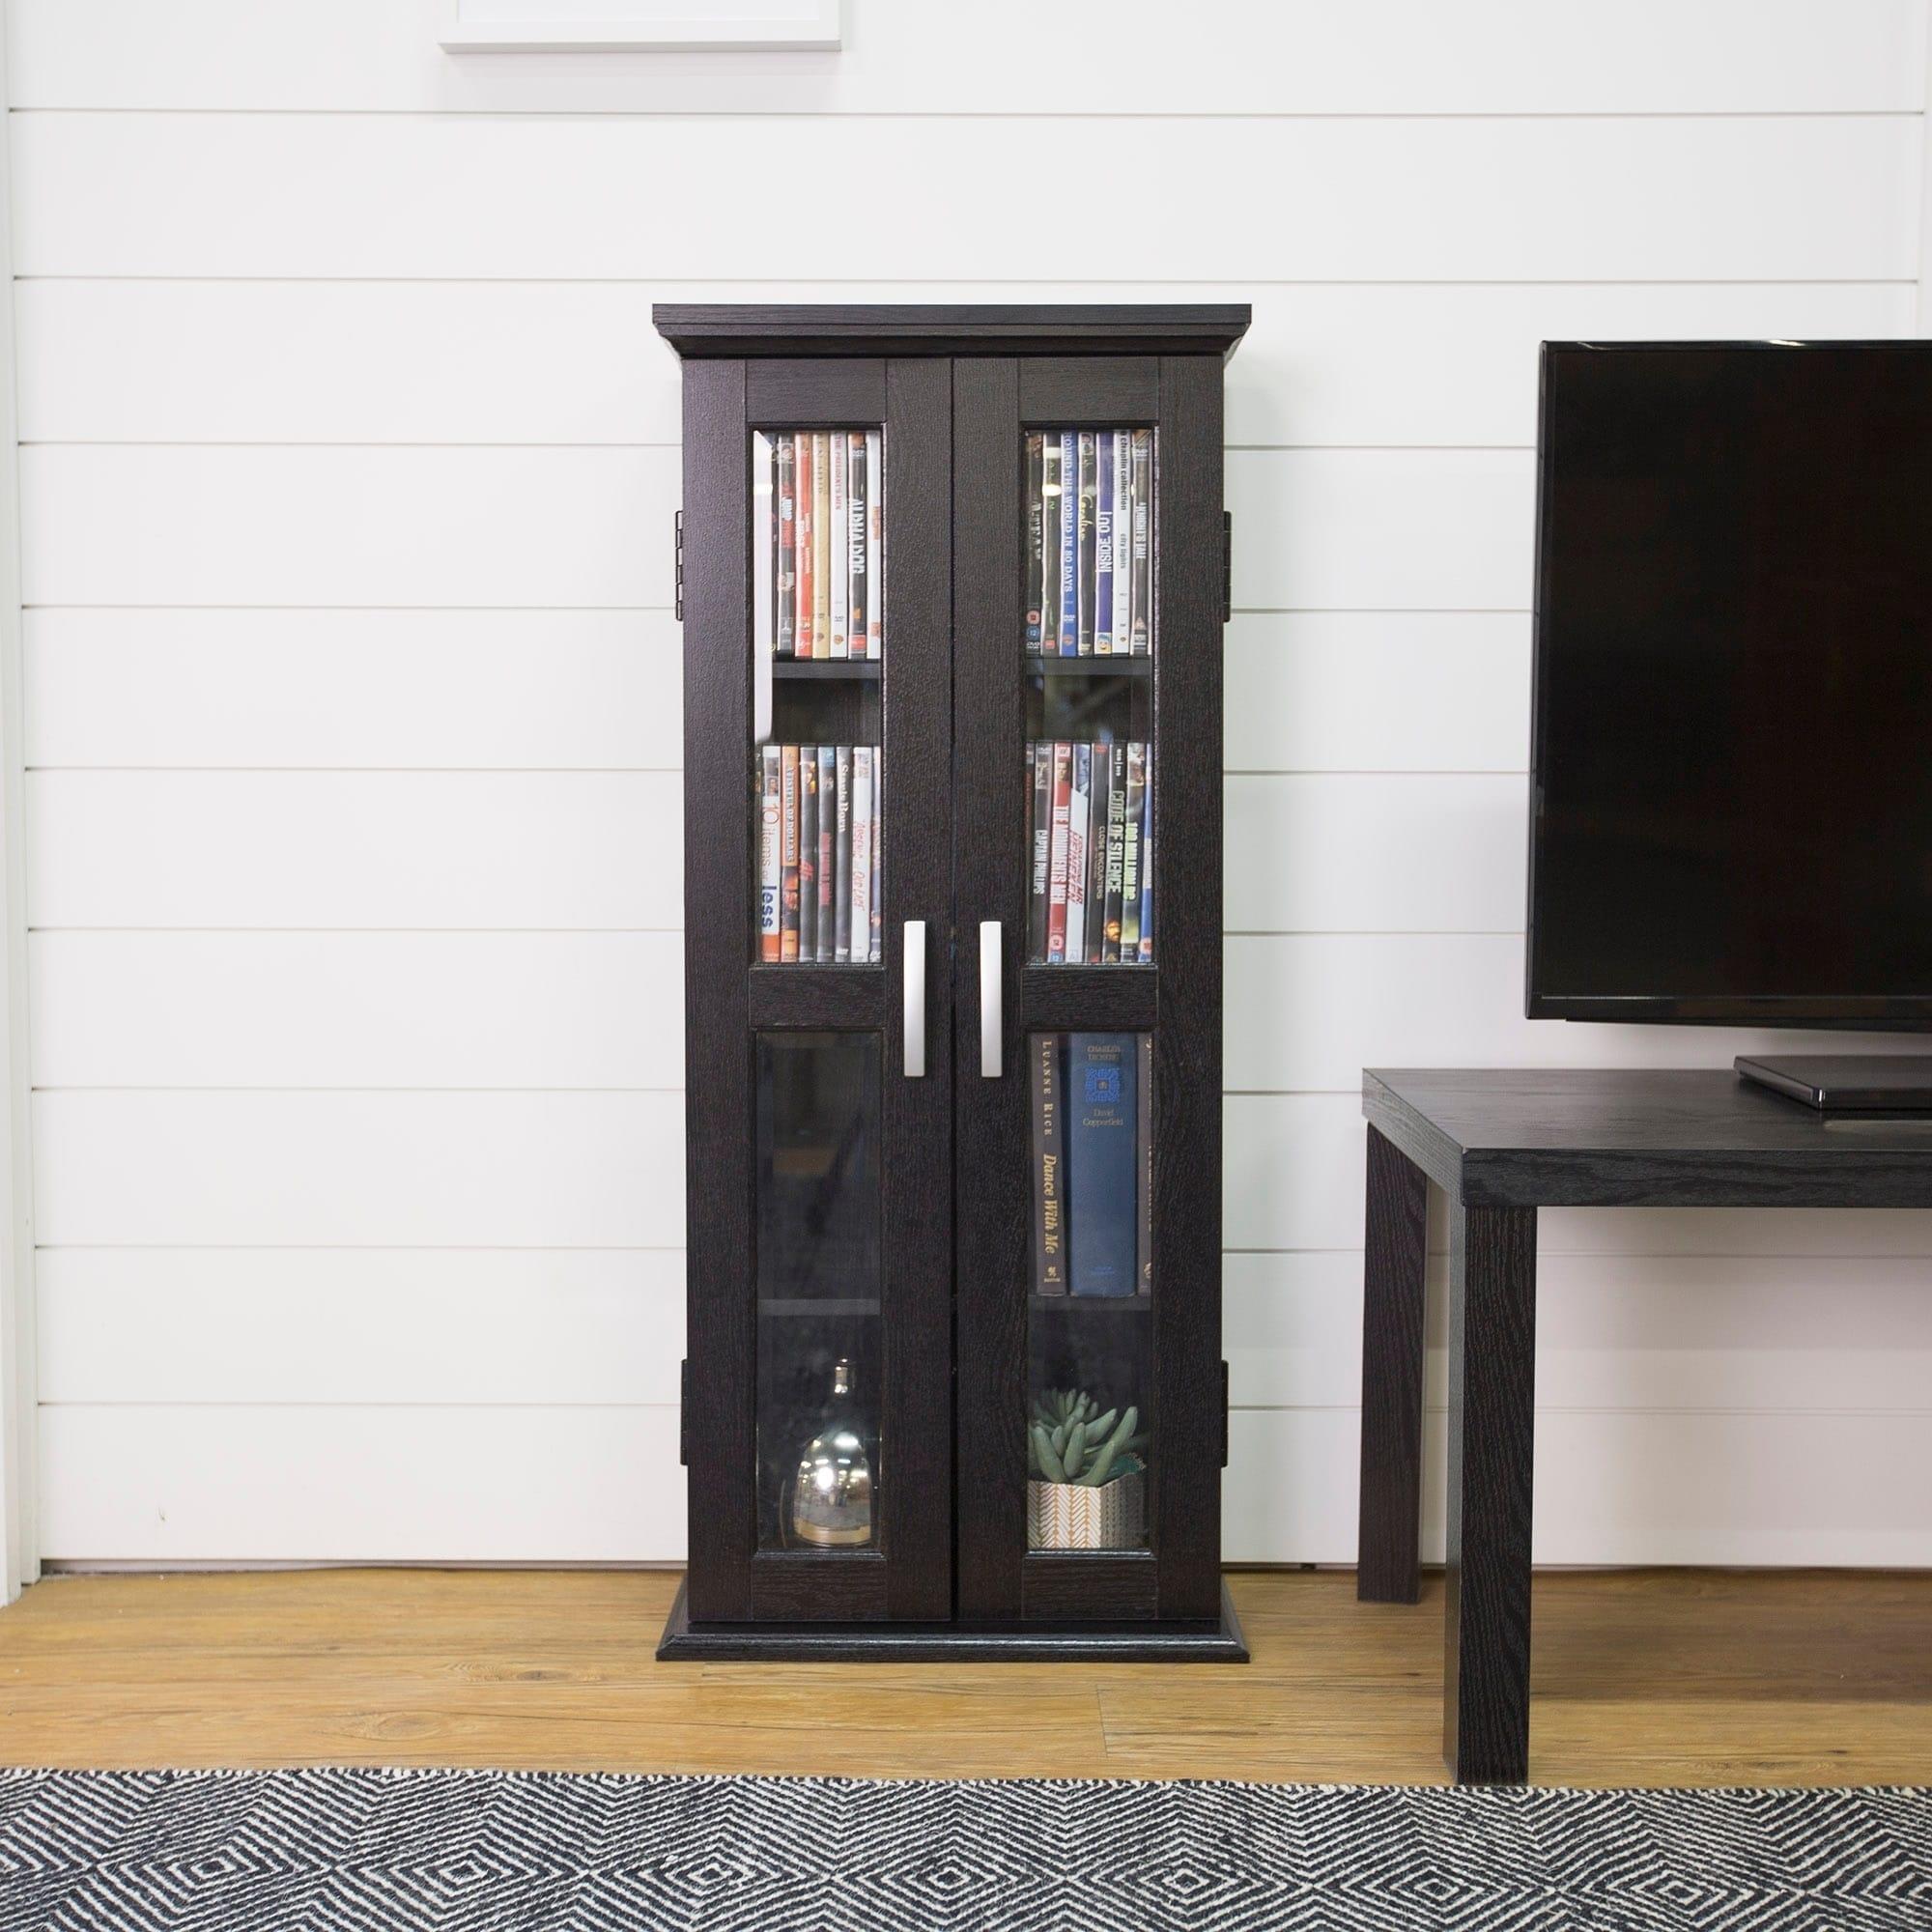 Uncategorized Contemporary Media Storage contemporary media storage cabinet tower black bookshelves organizer wood frame